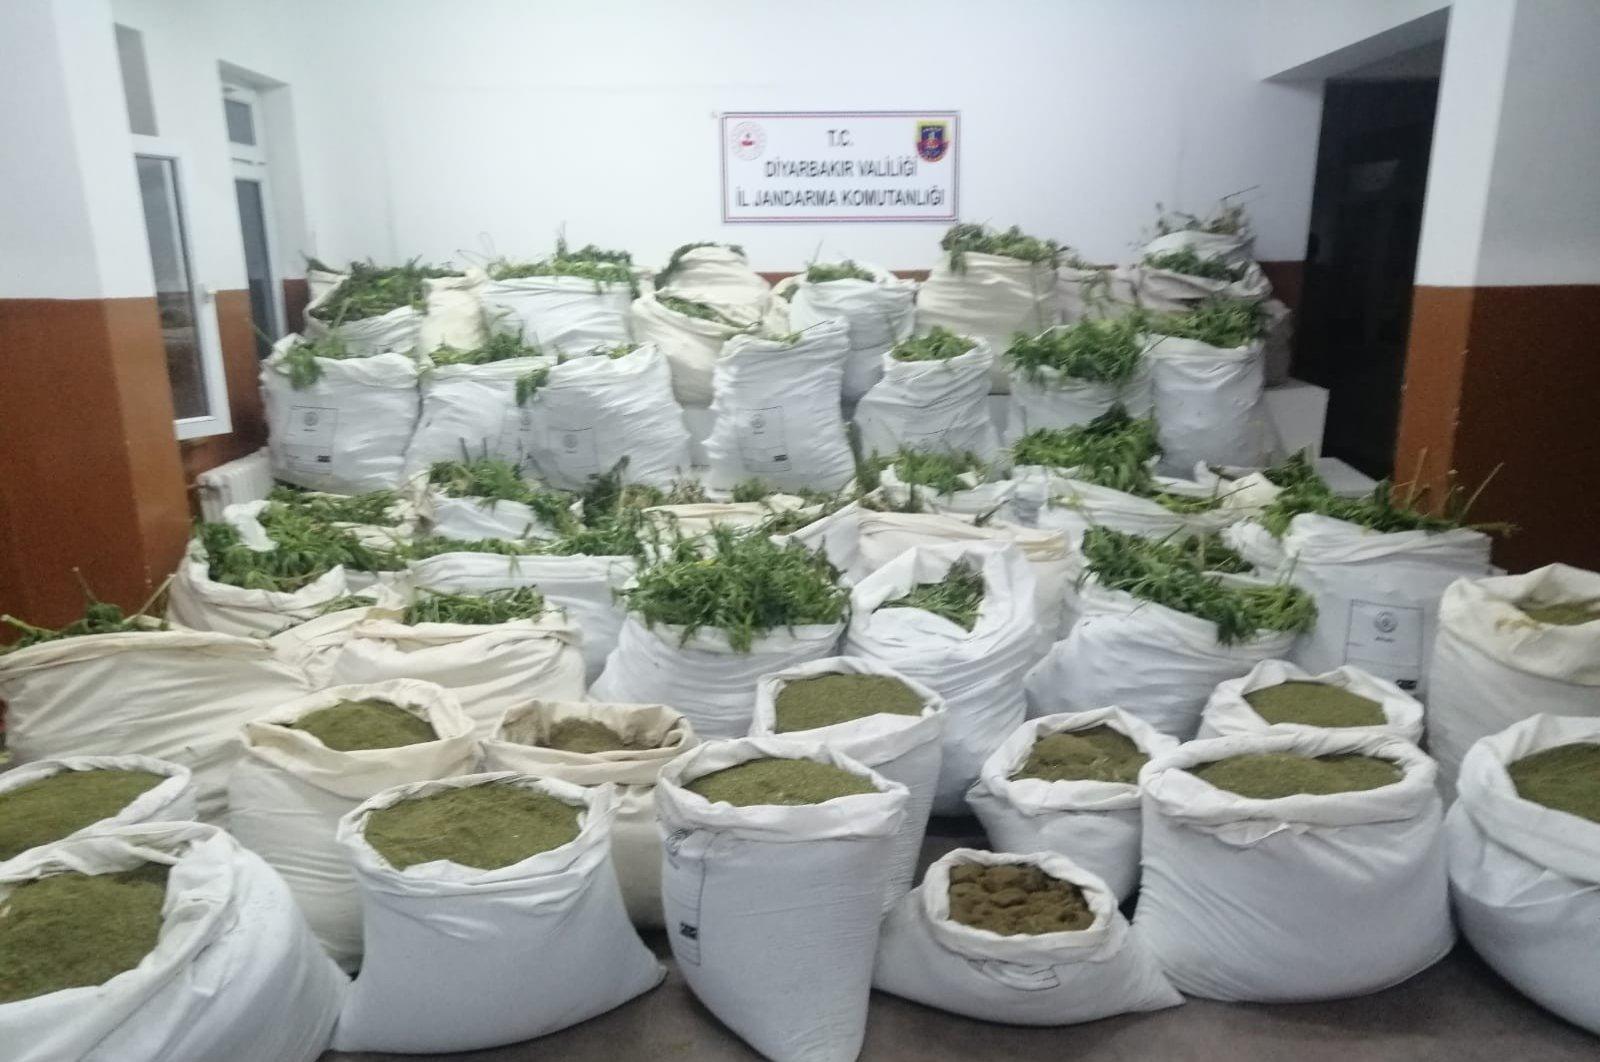 Seized marijuana on display at security forces headquarters in Diyarbakır, Turkey, June 22, 2020. (IHA Photo)